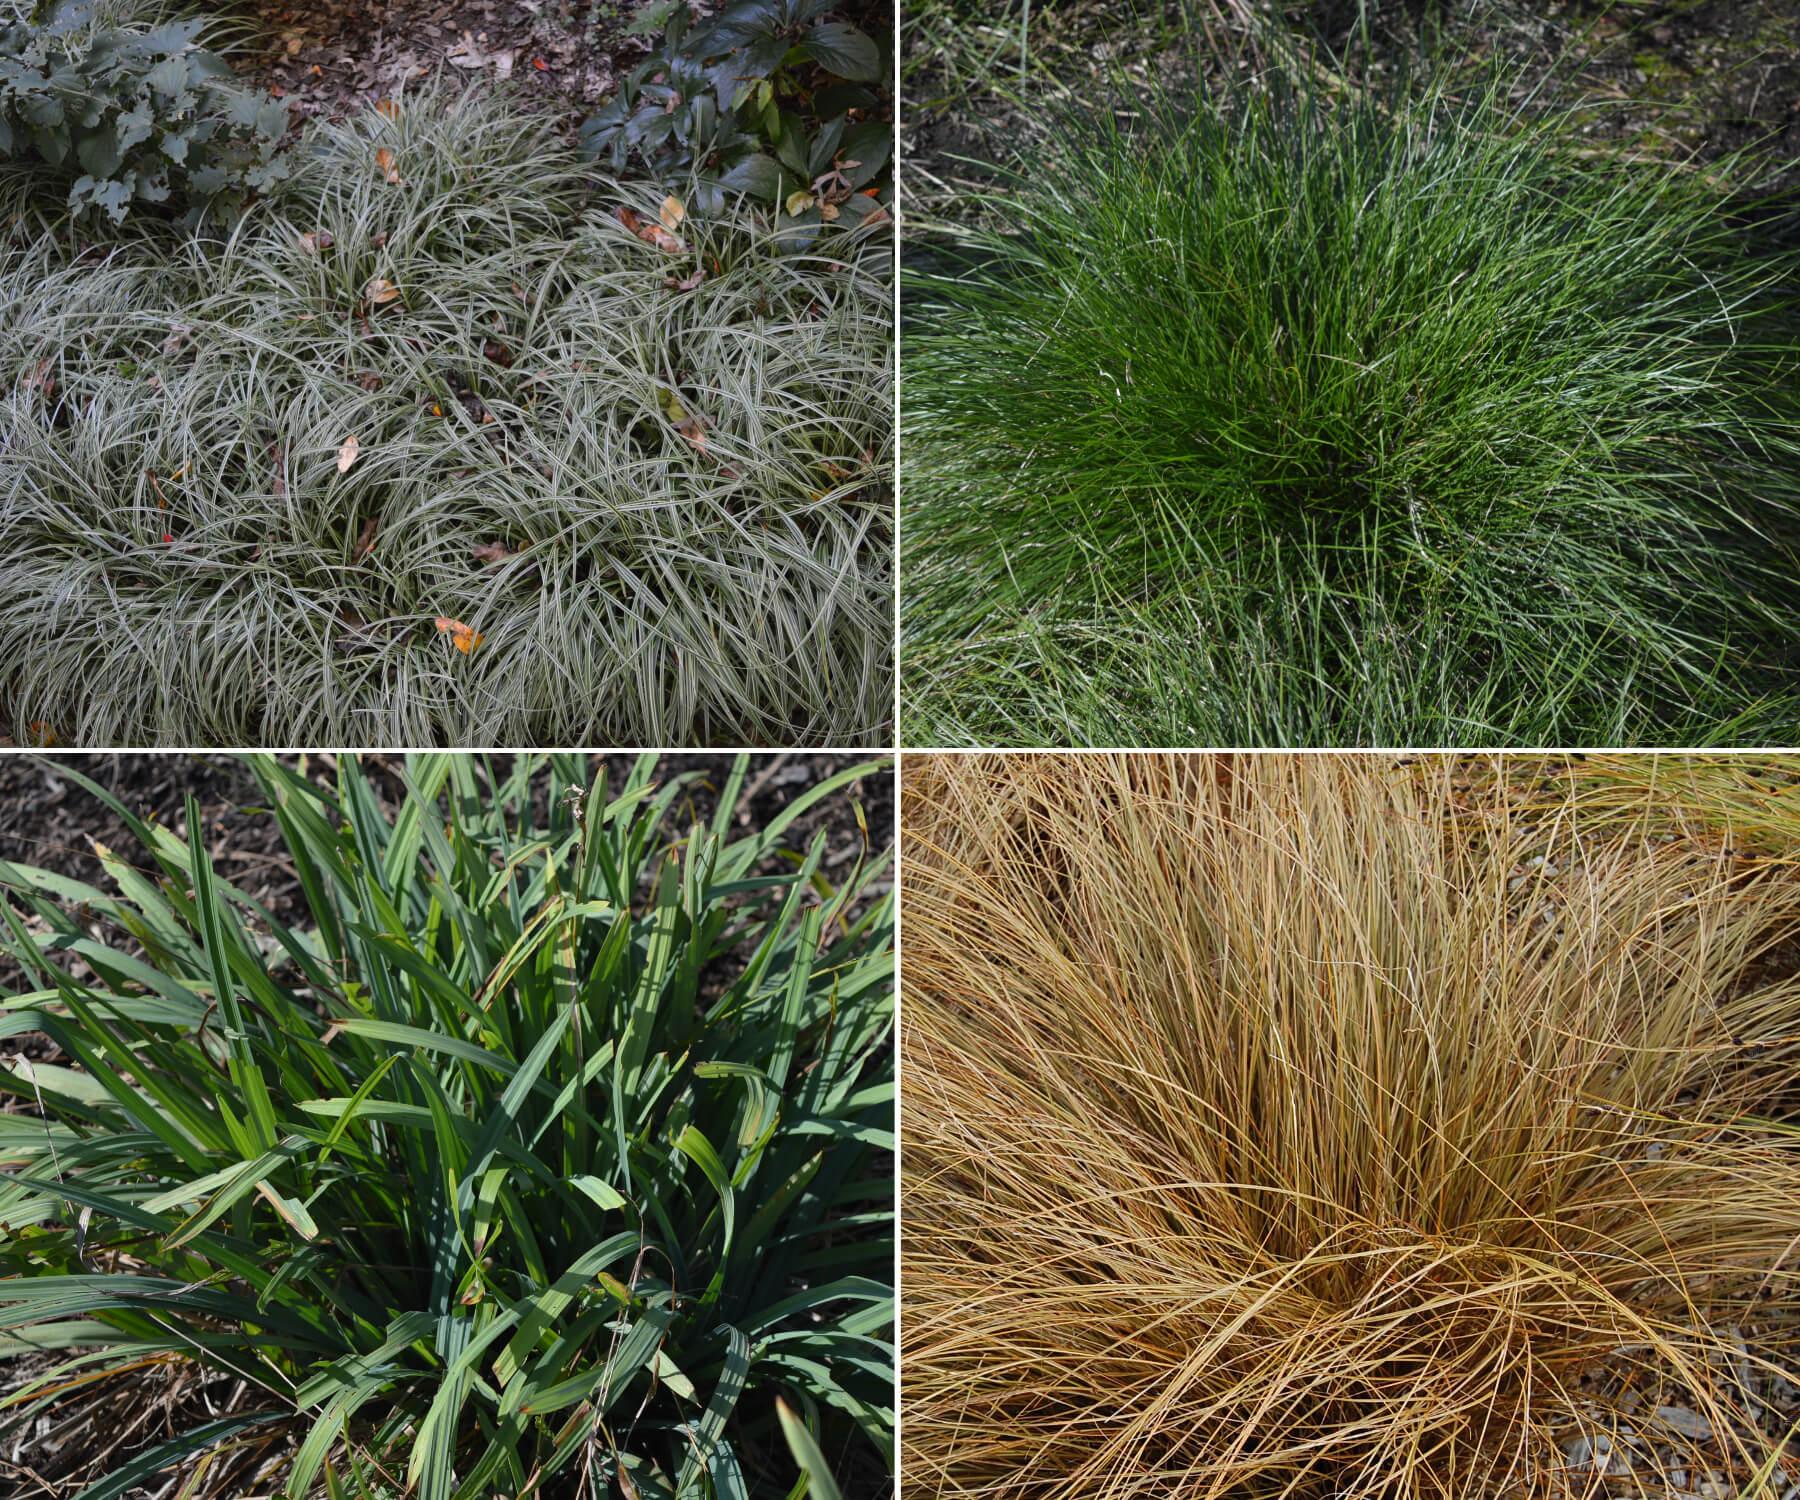 Sedges, Carex species; C. 'Silver Sceptre', C. bromoides, C. flaccosperma, C. comans.